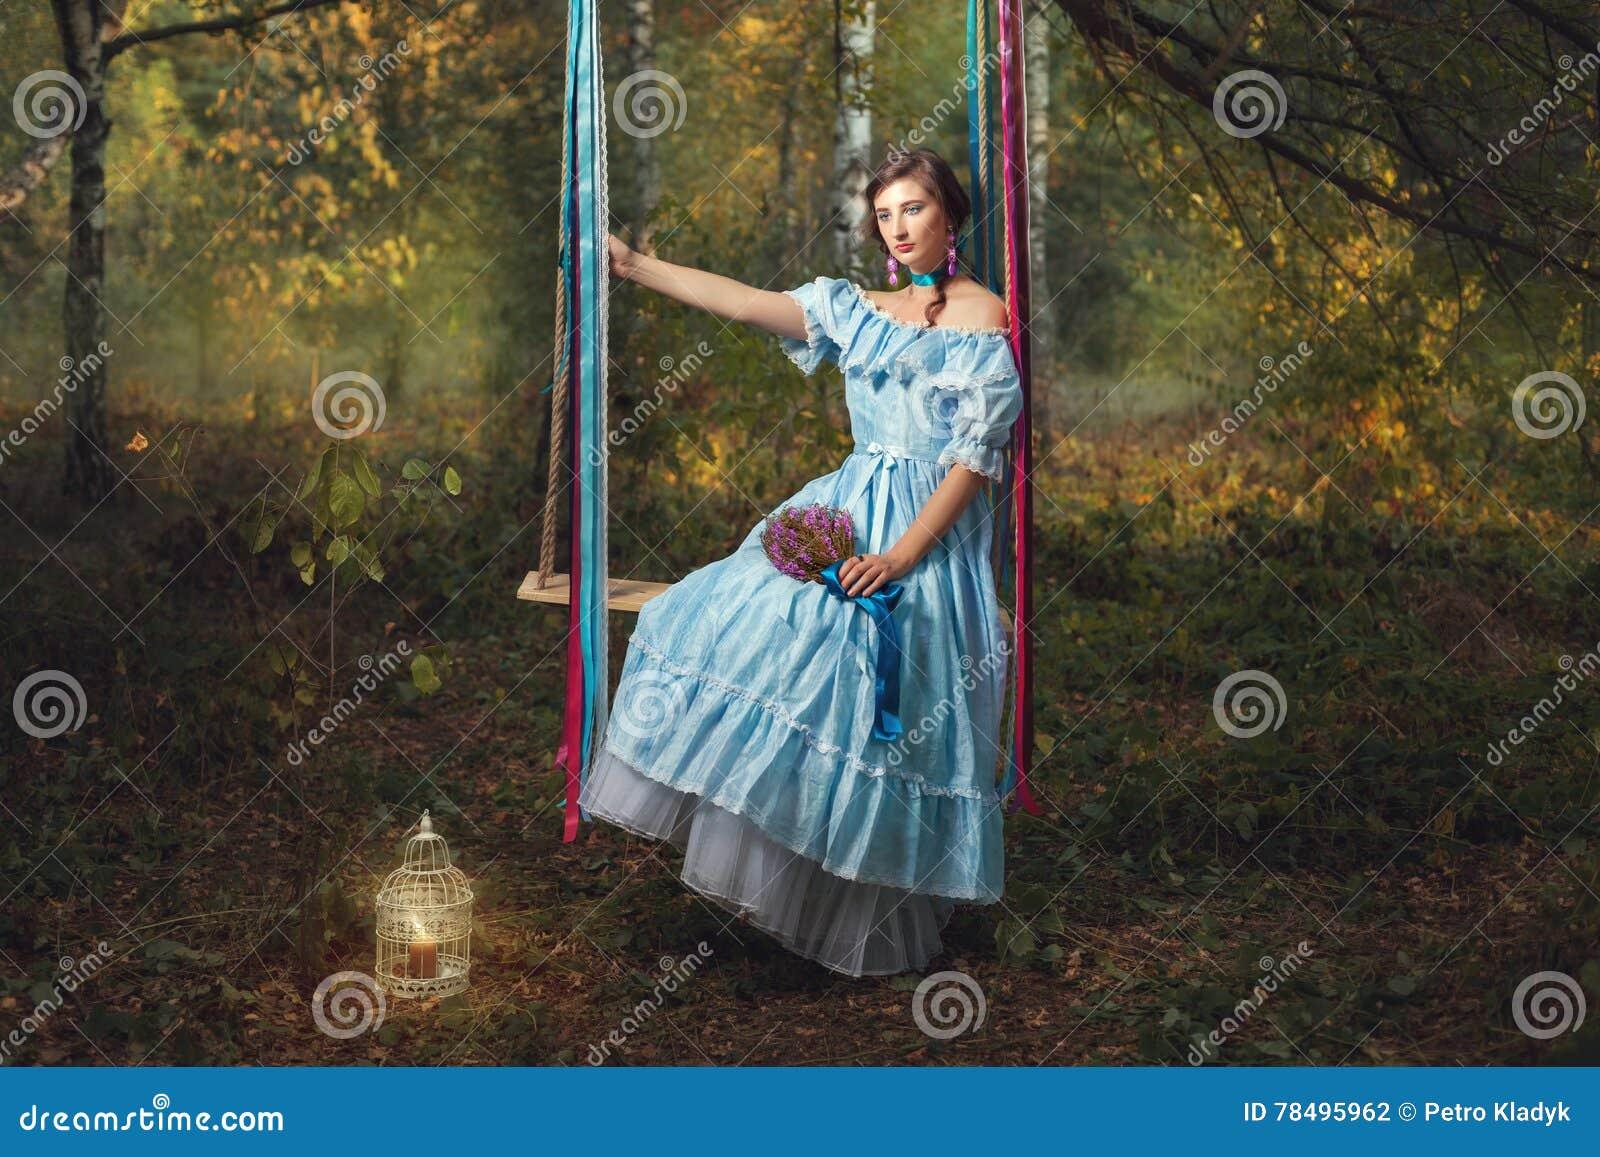 Sad woman on a swing.